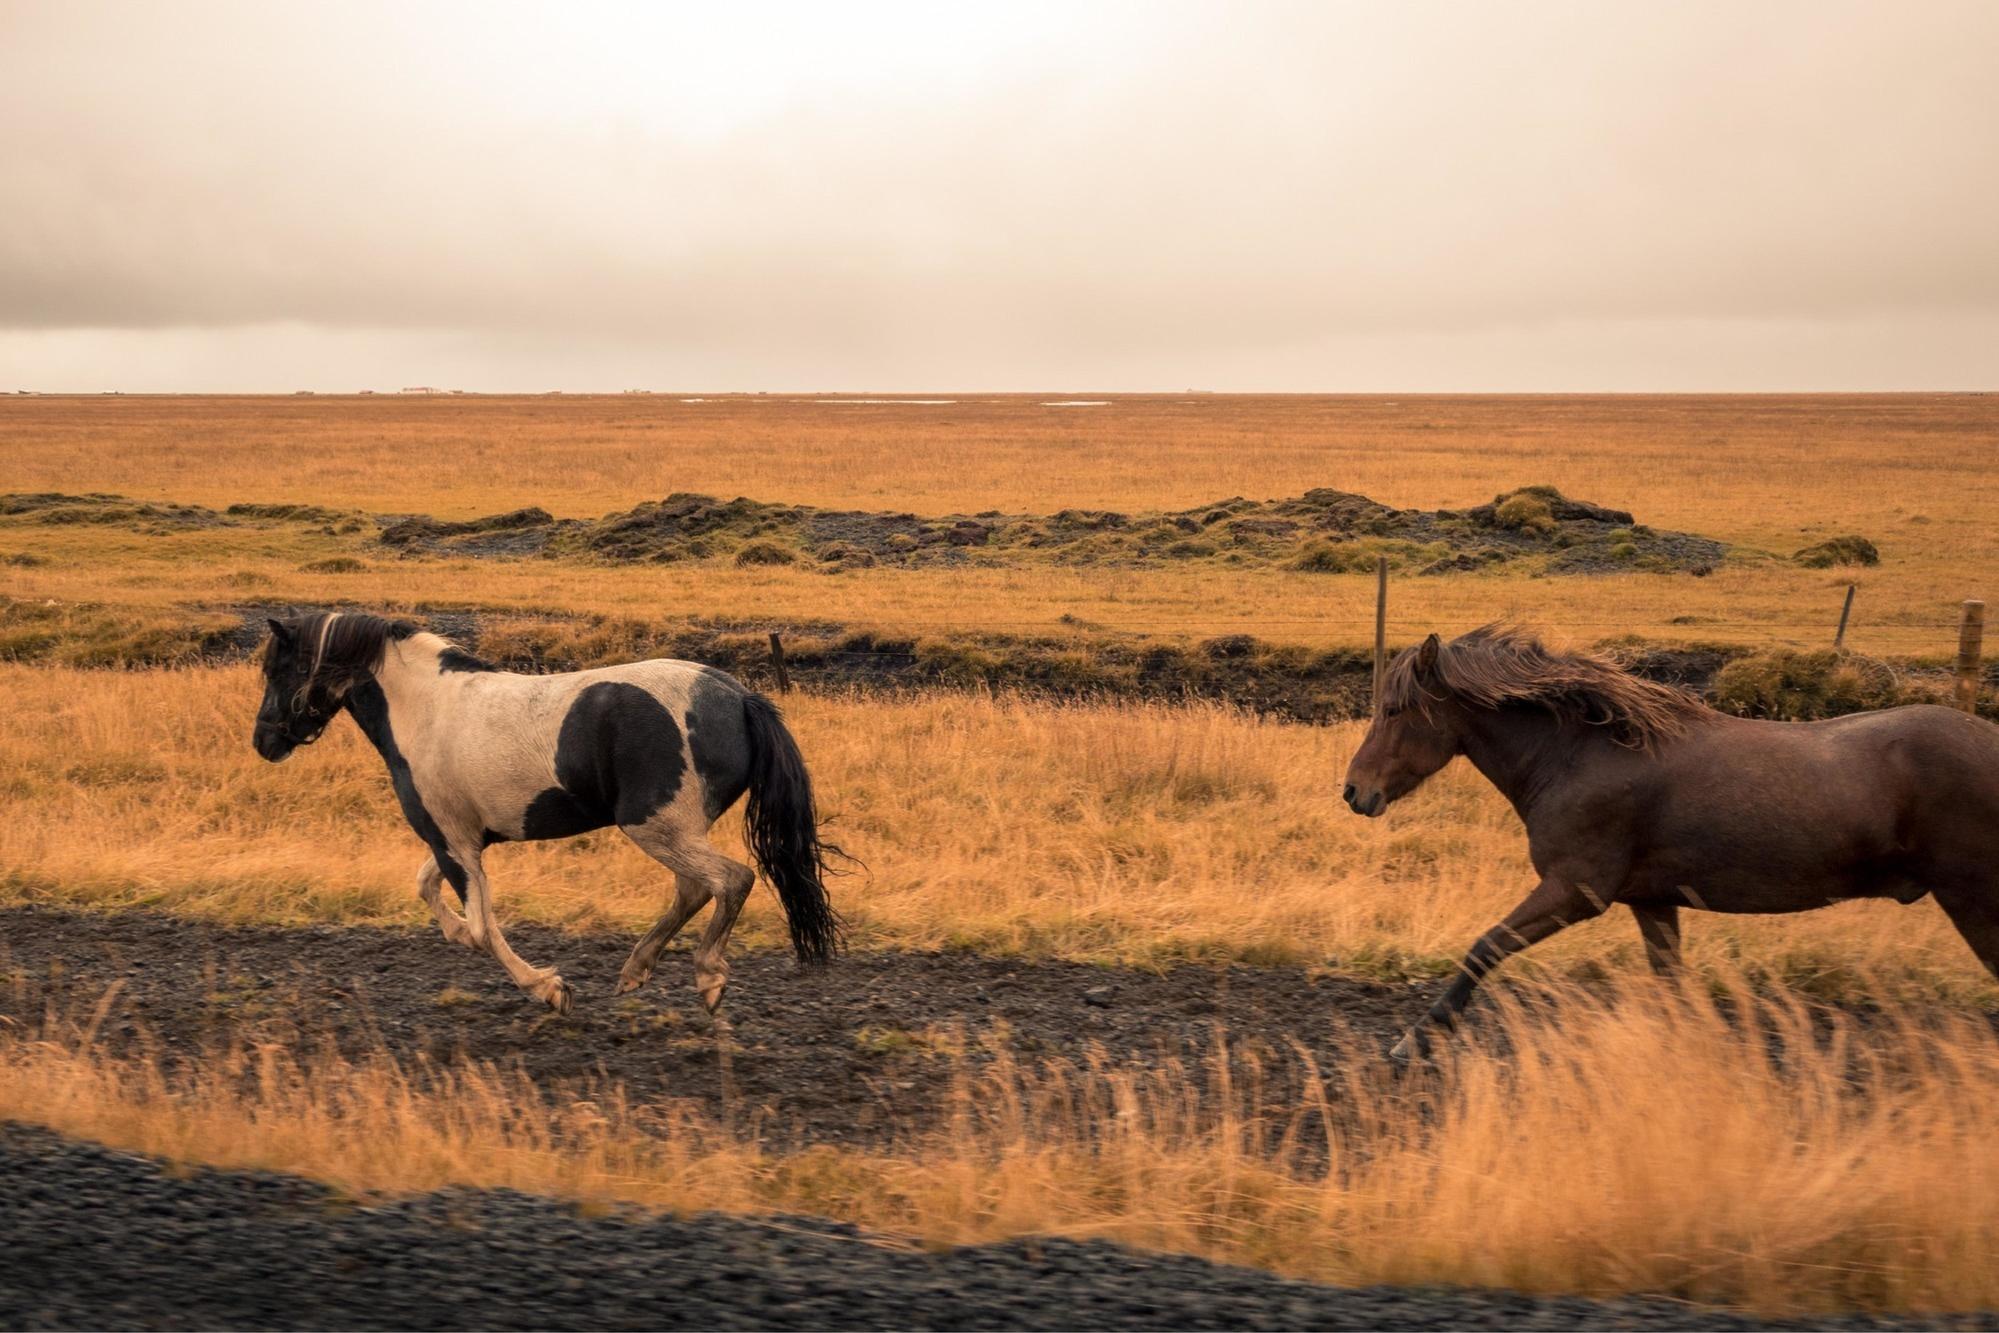 Parker, Colorado Horse property for Sale Kenna Real Estate